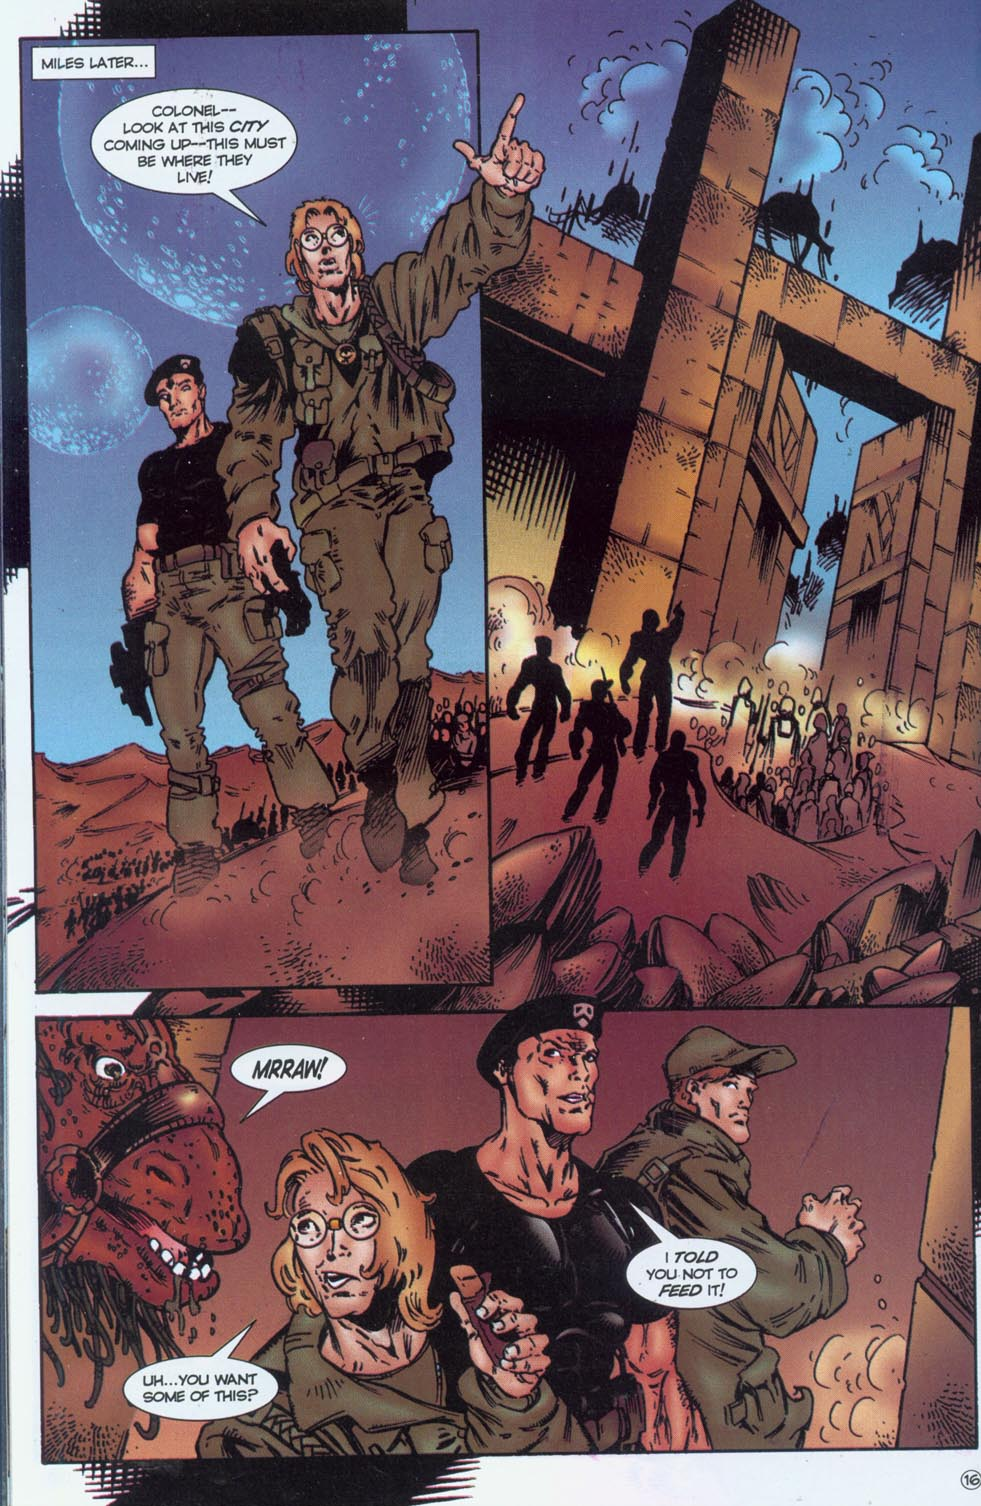 Read online Stargate comic -  Issue #1 - 18